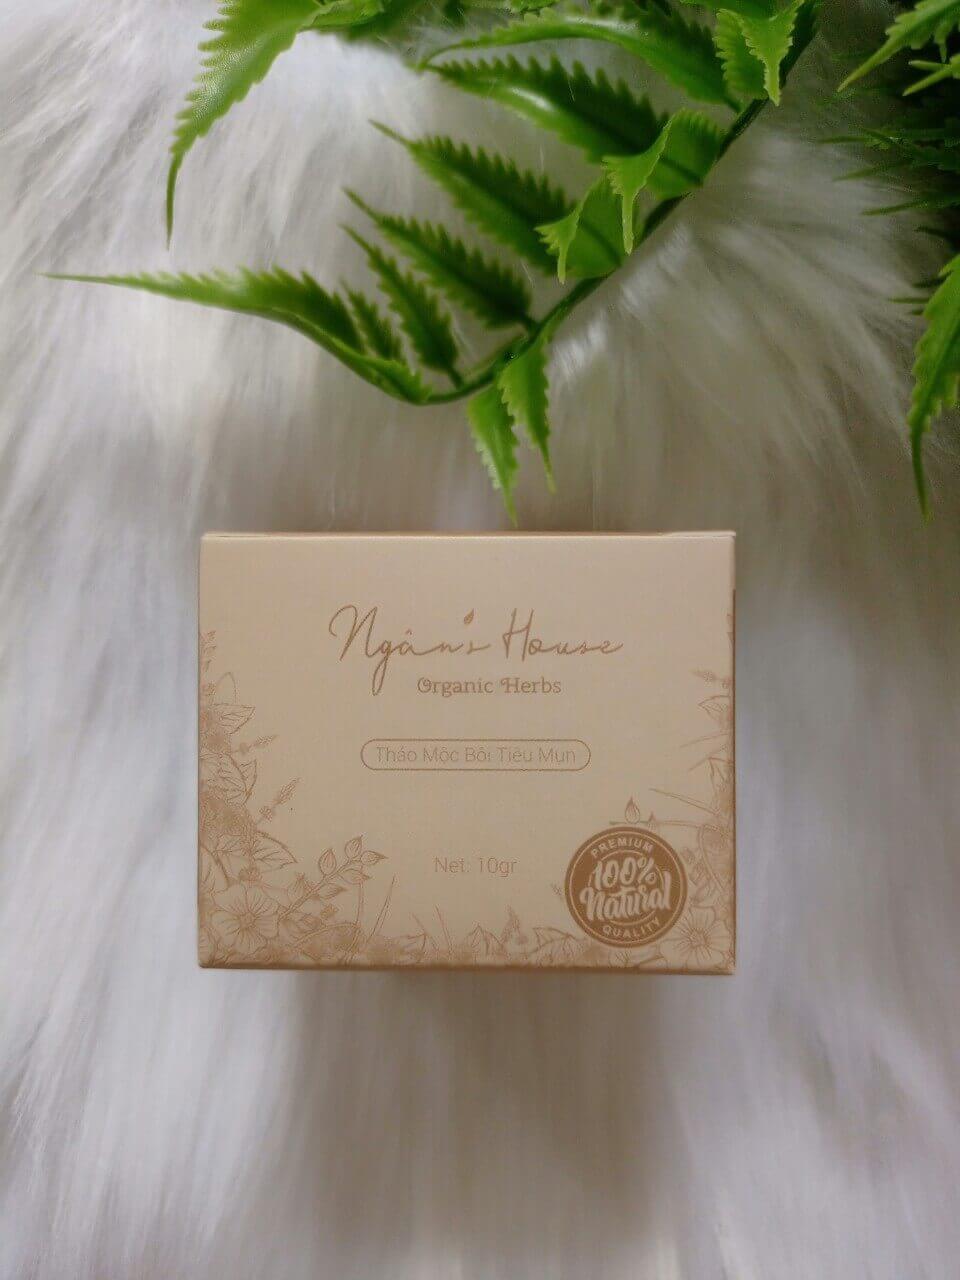 ngân-house-organic-herbs